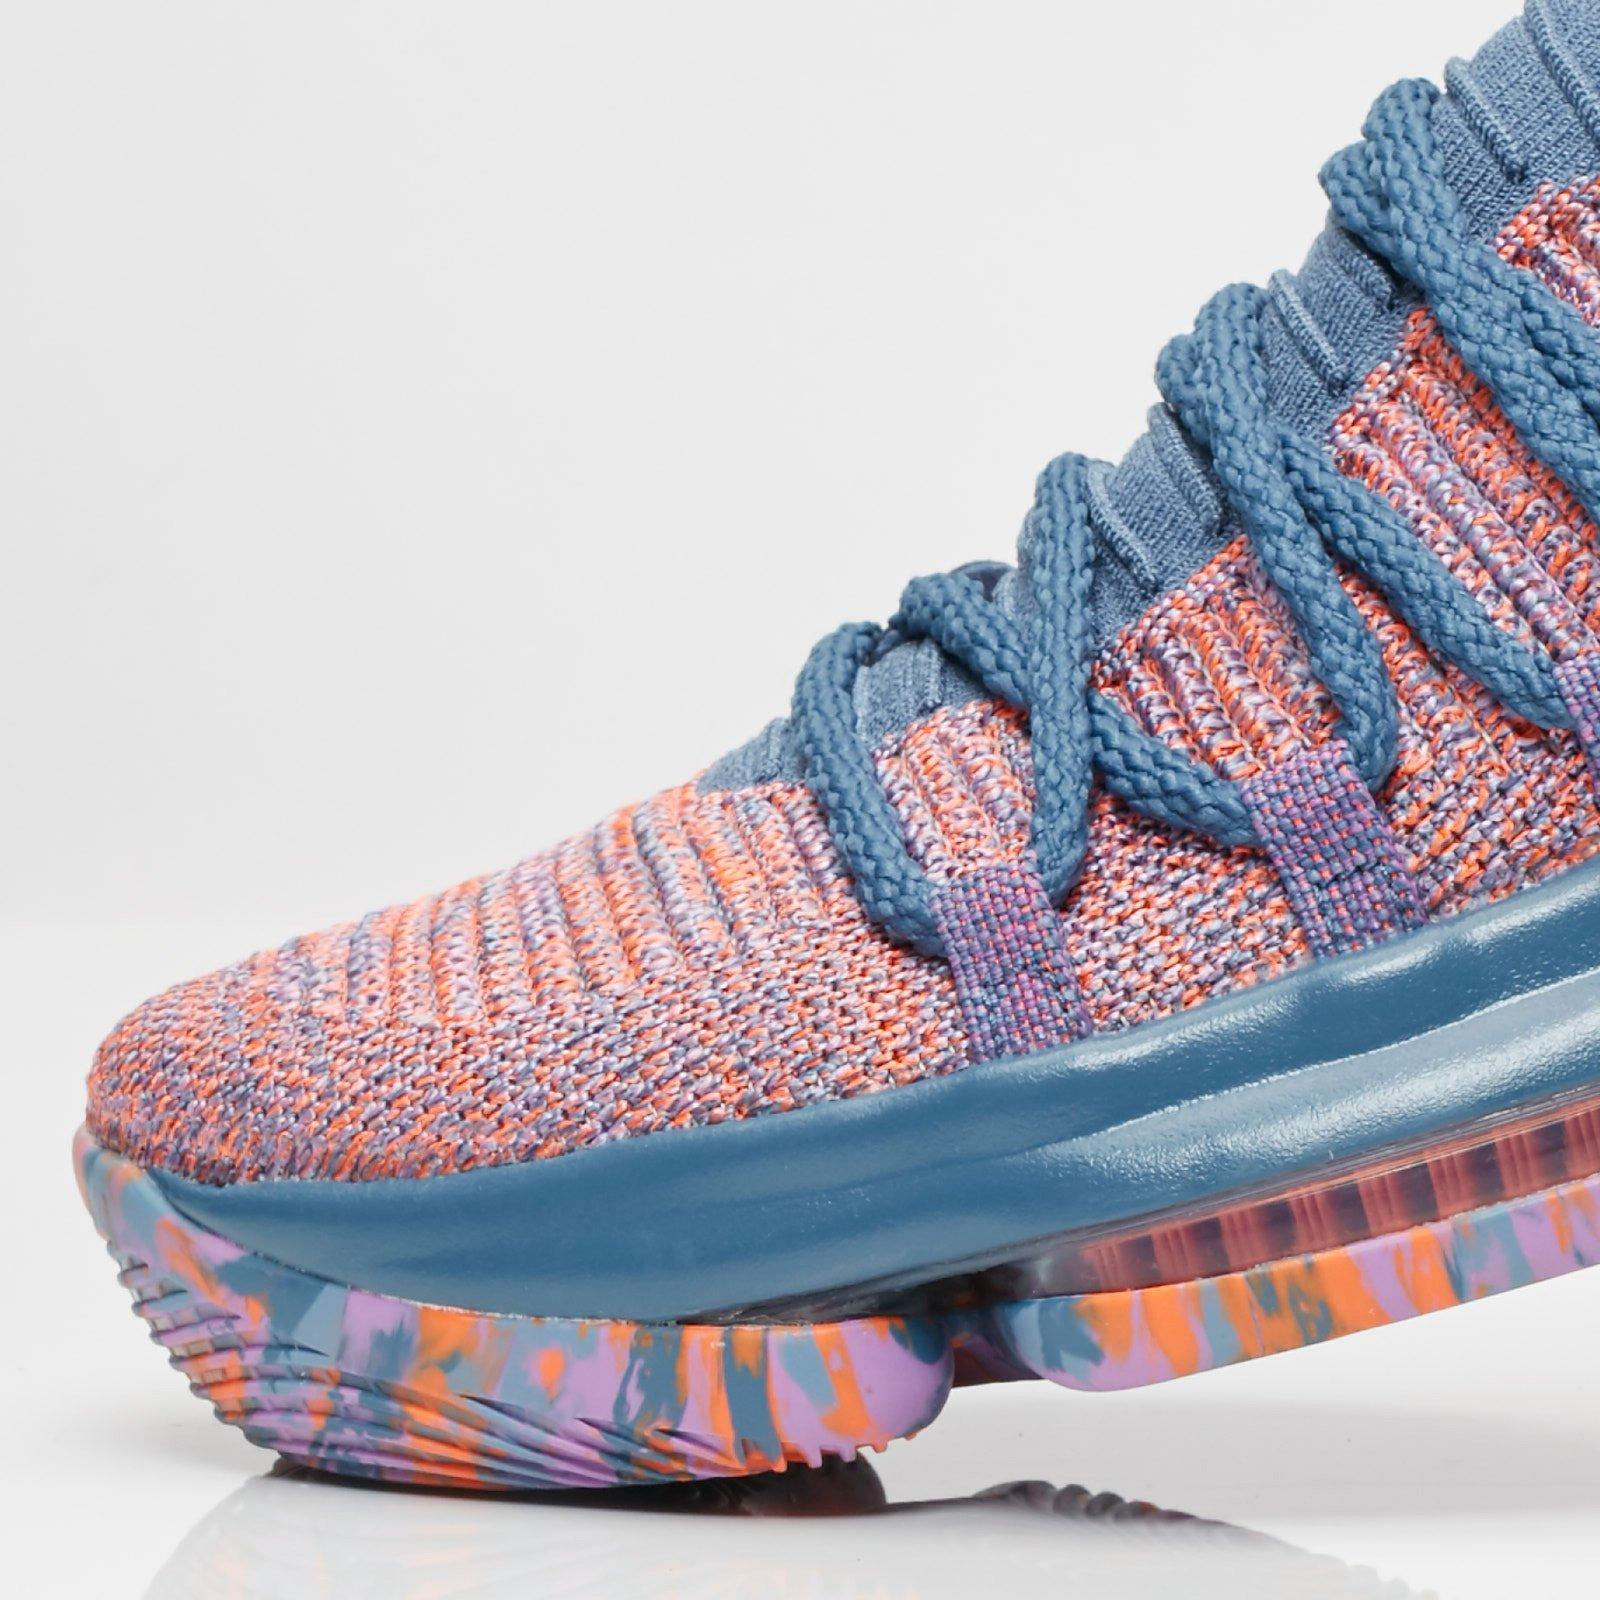 new product acc6c b39d4 Nike Zoom KD10 LMTD - 897817-400 - Sneakersnstuff I Sneakers ...